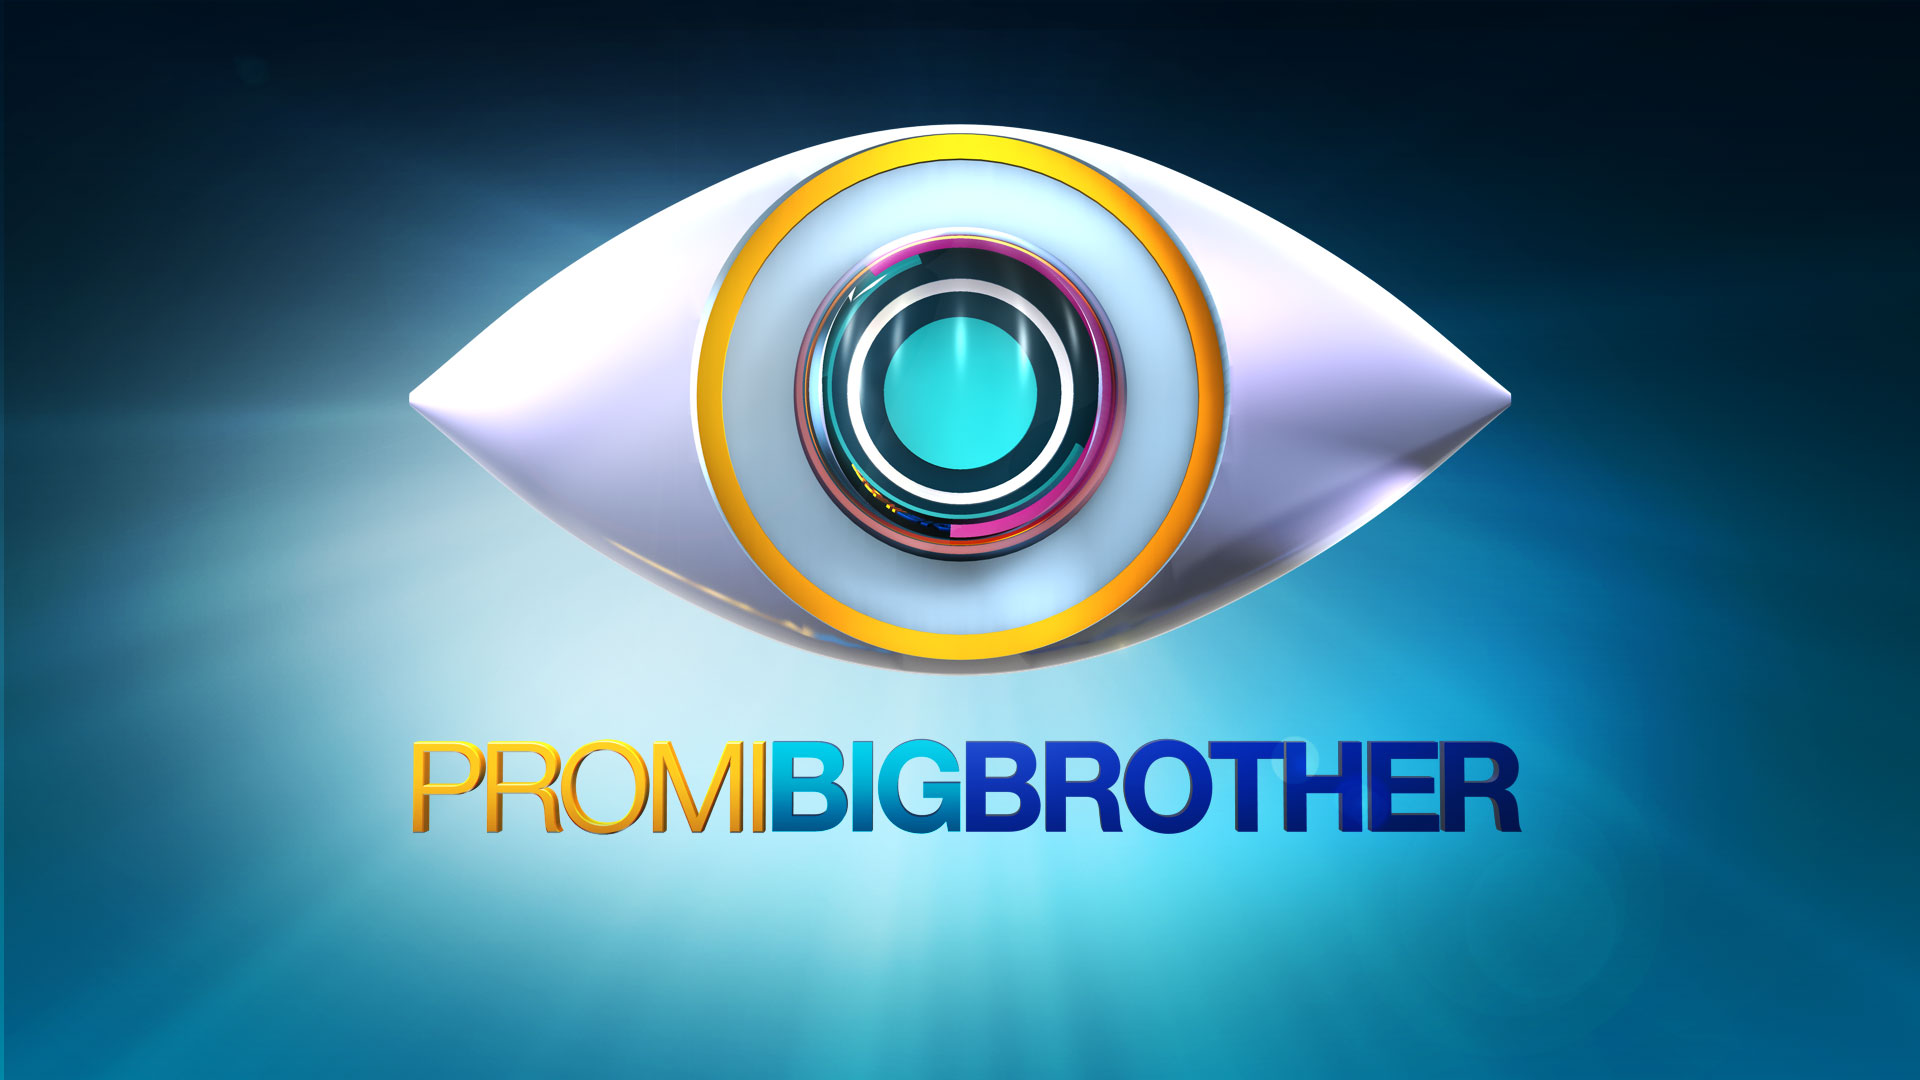 promi big brother 2013